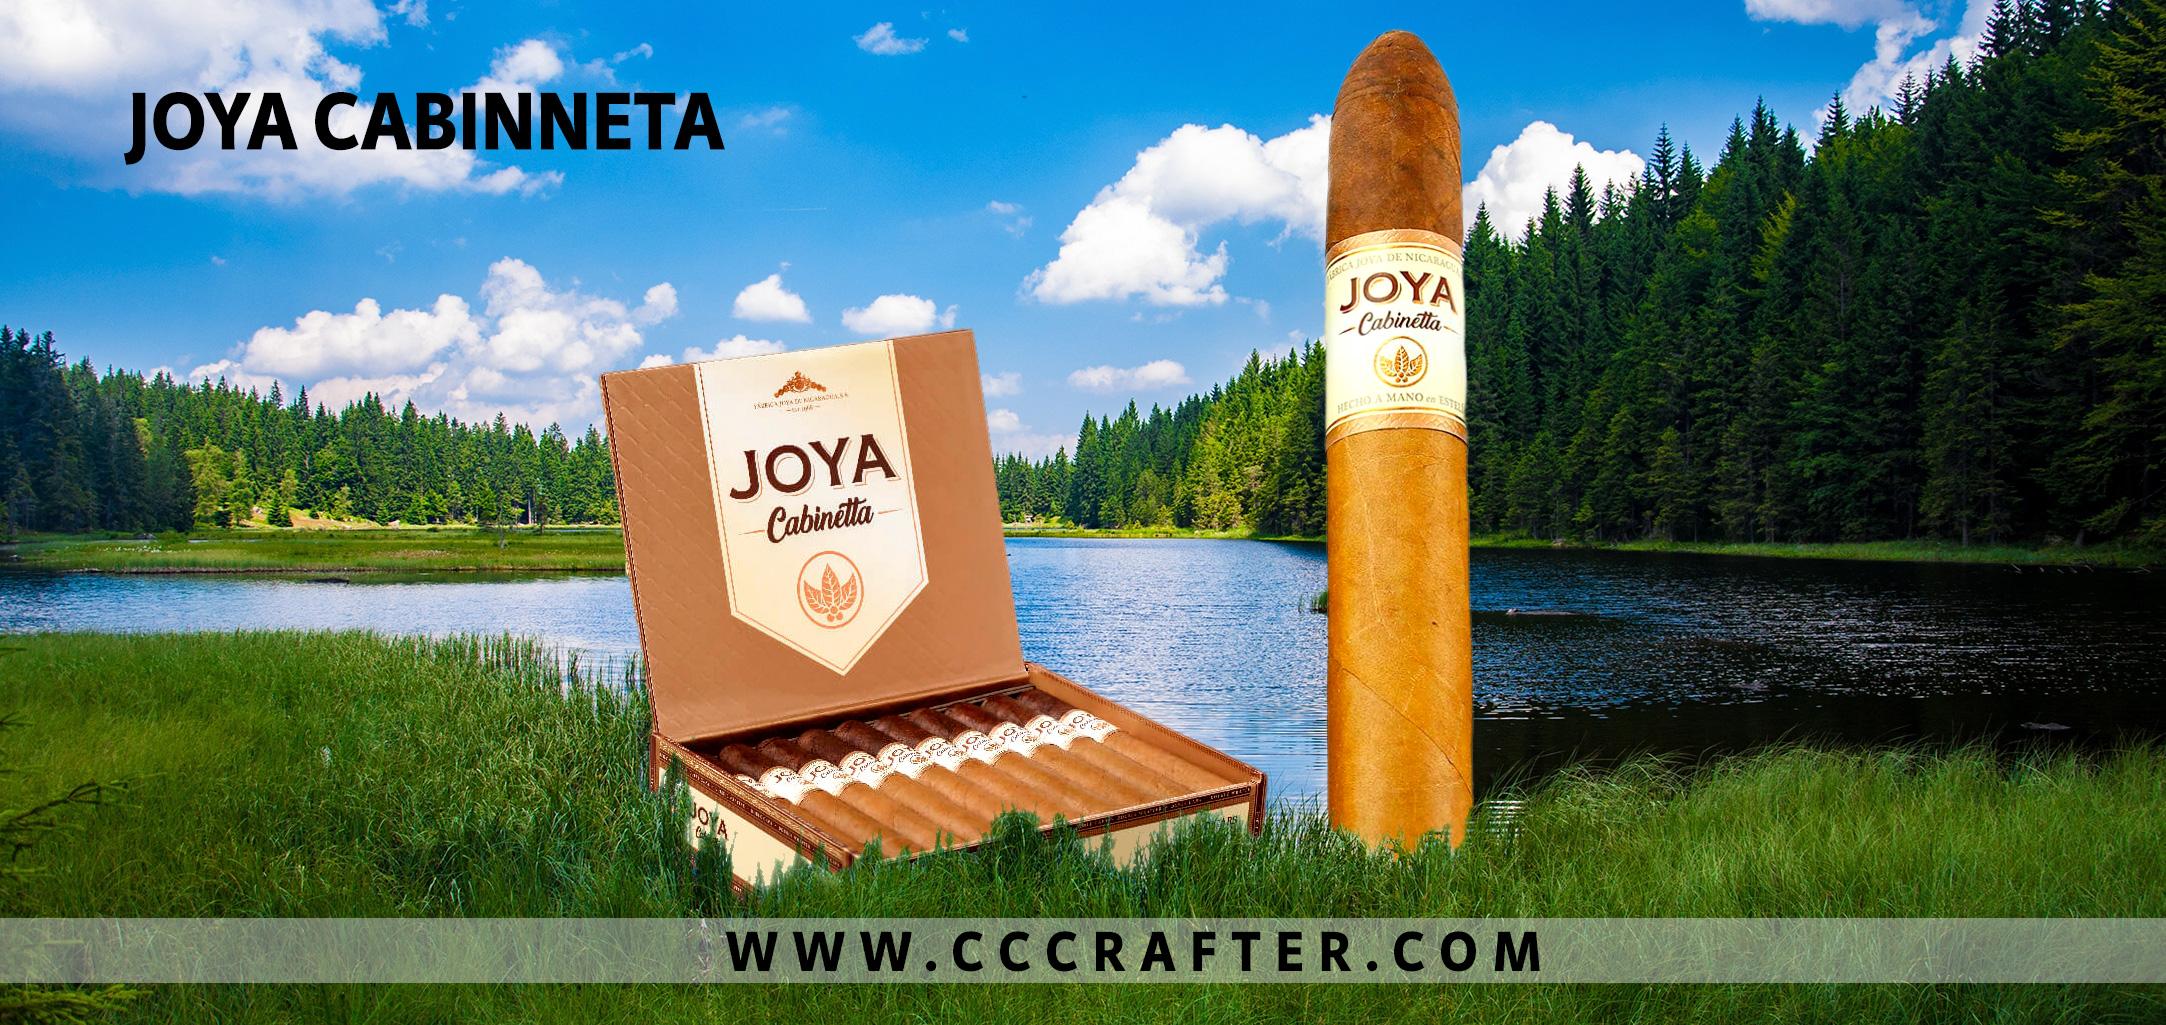 joya-cabinneta-banner-2.jpg